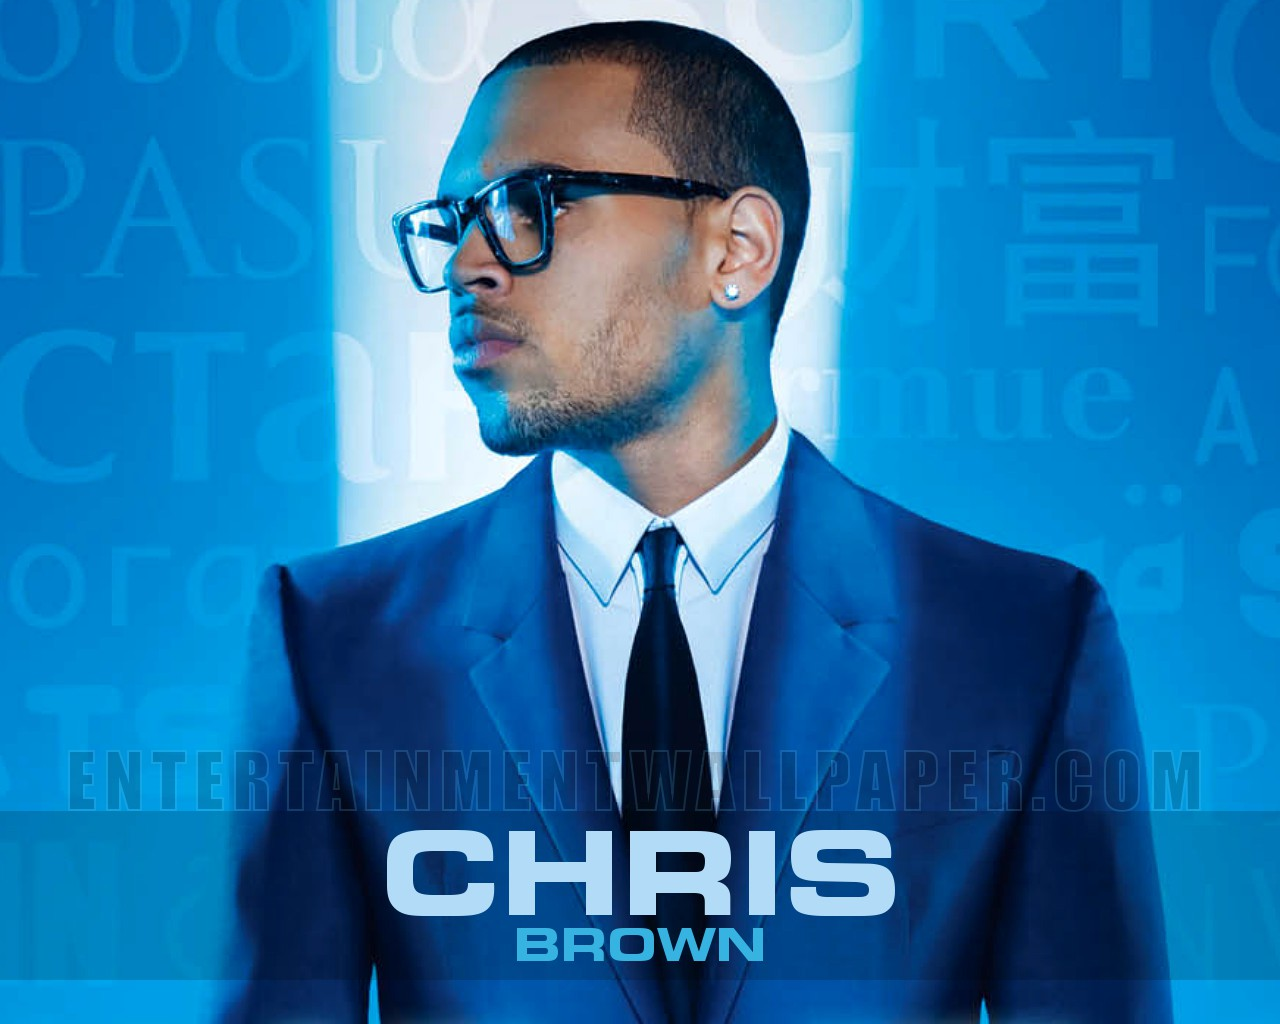 Chris Brown Wallpaper - Original size, download now.